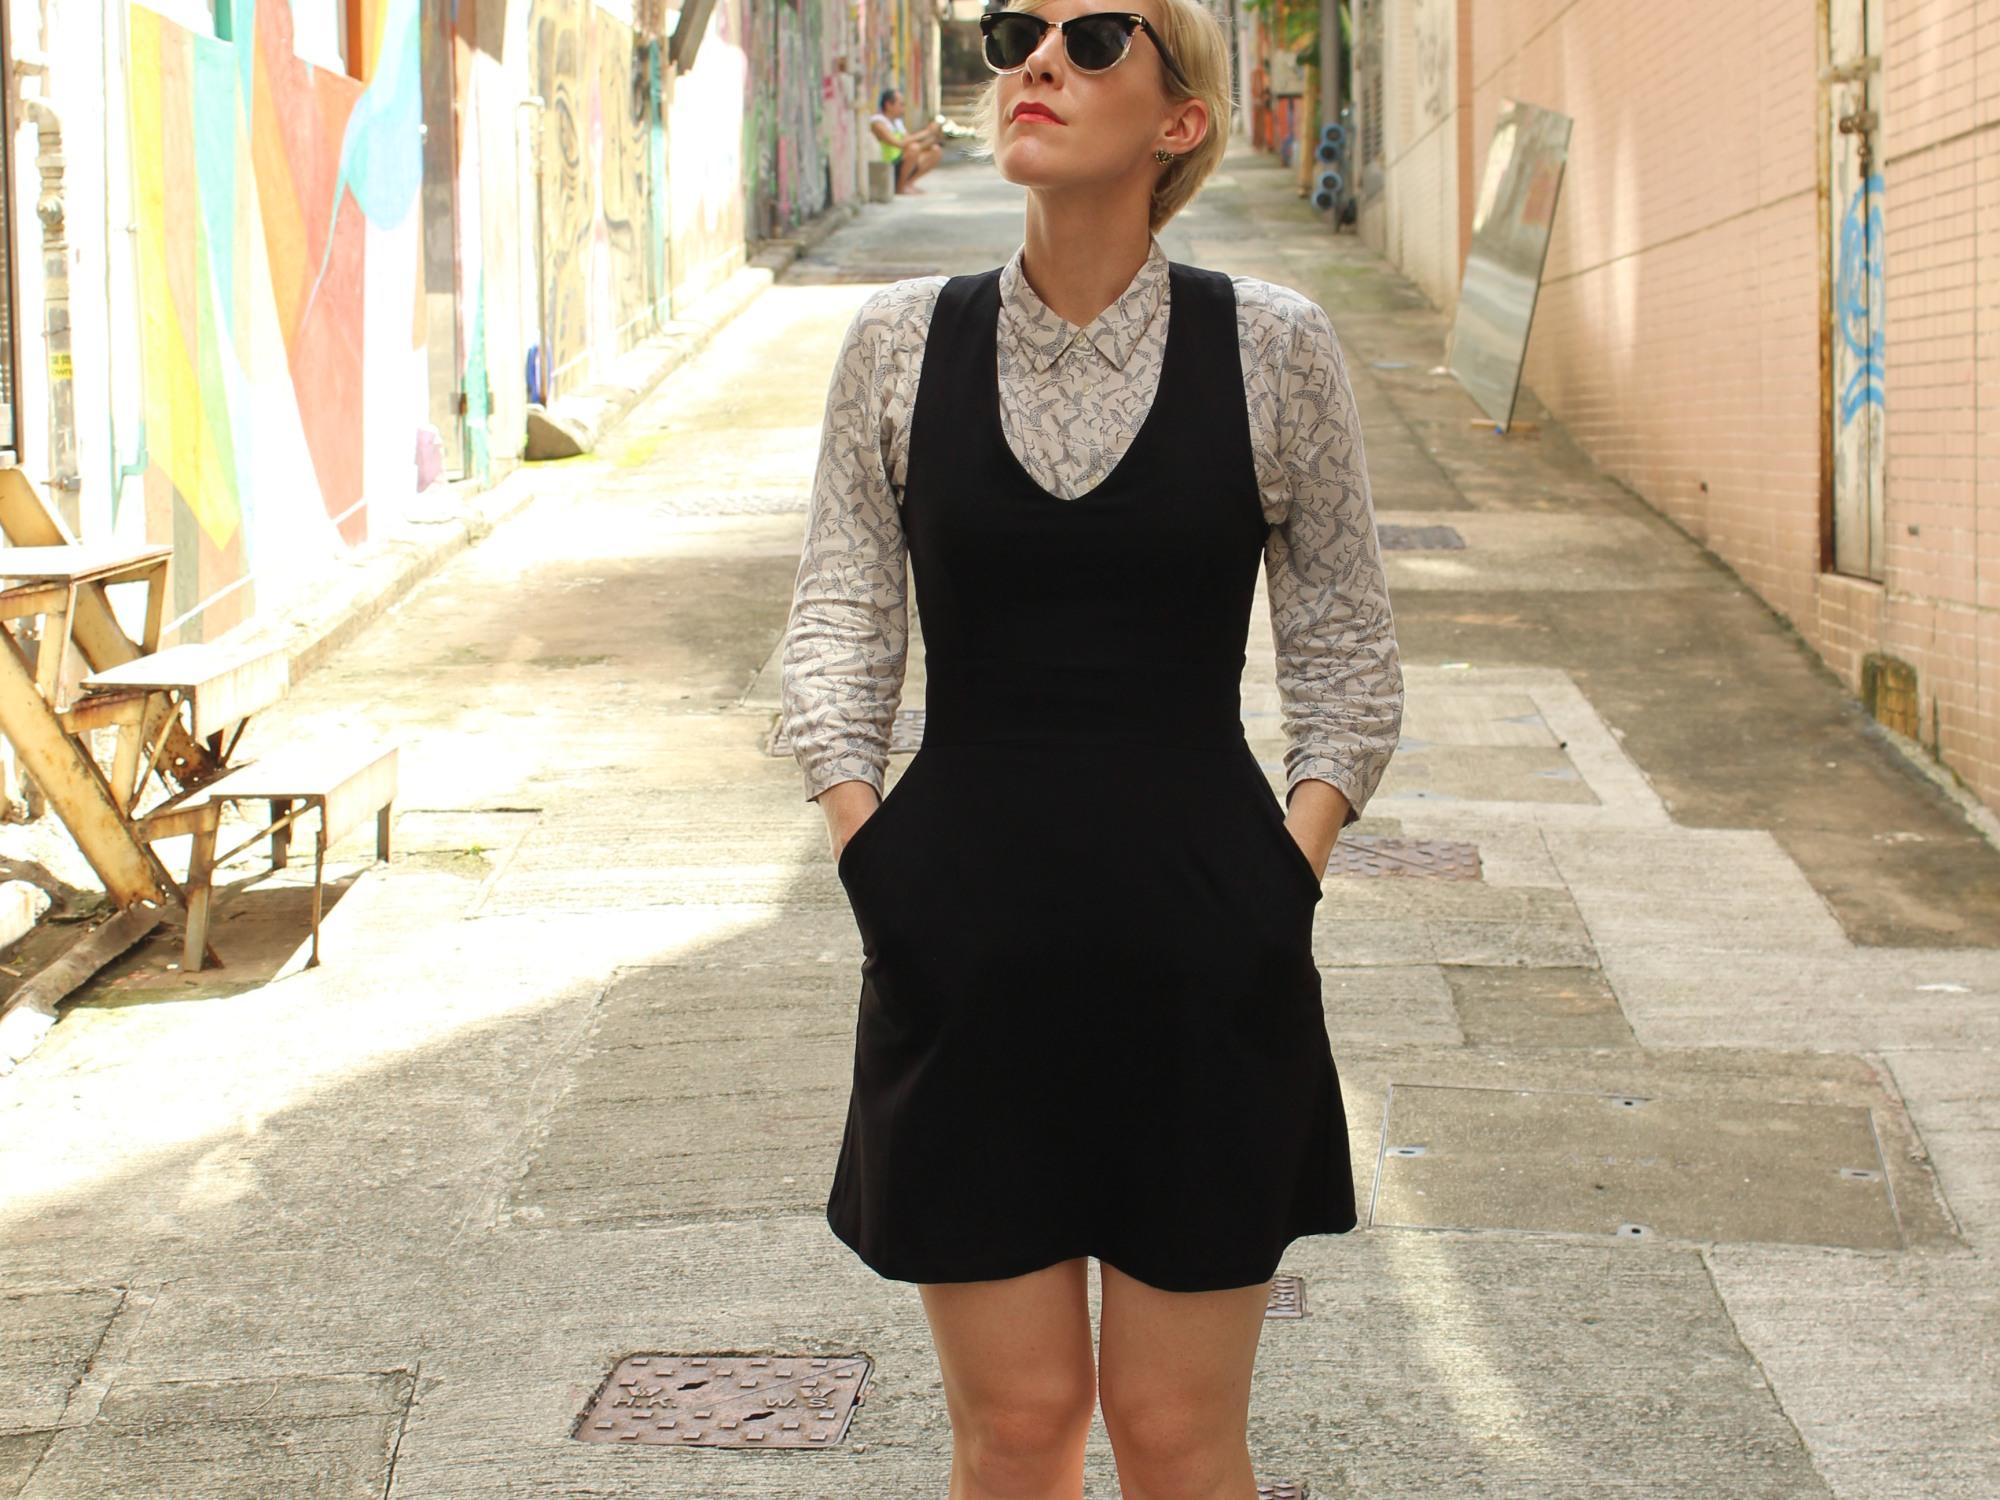 That's me, Lauren, looking all cool in Hong Kong!